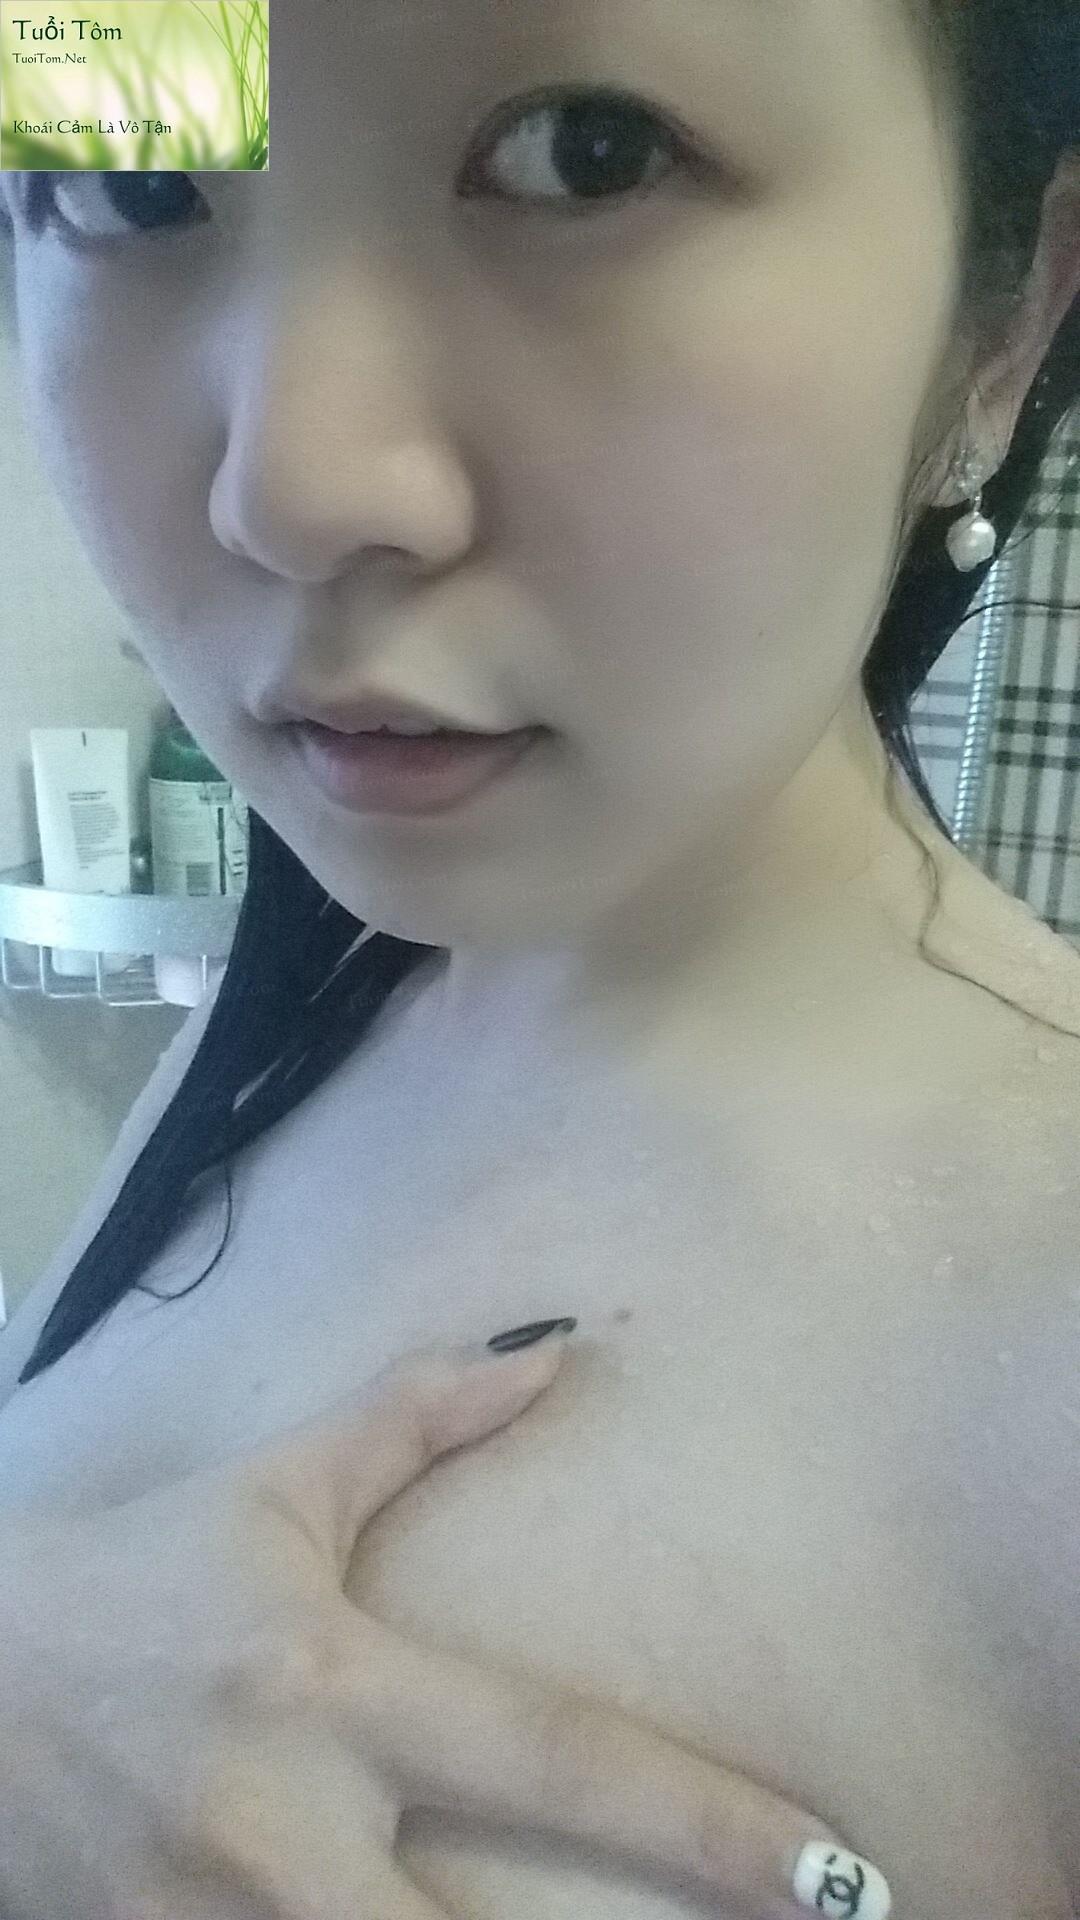 Shy_Adorable_Teen_Xinshu_Feng_Shows_her_Cute_Little_Pussy_10